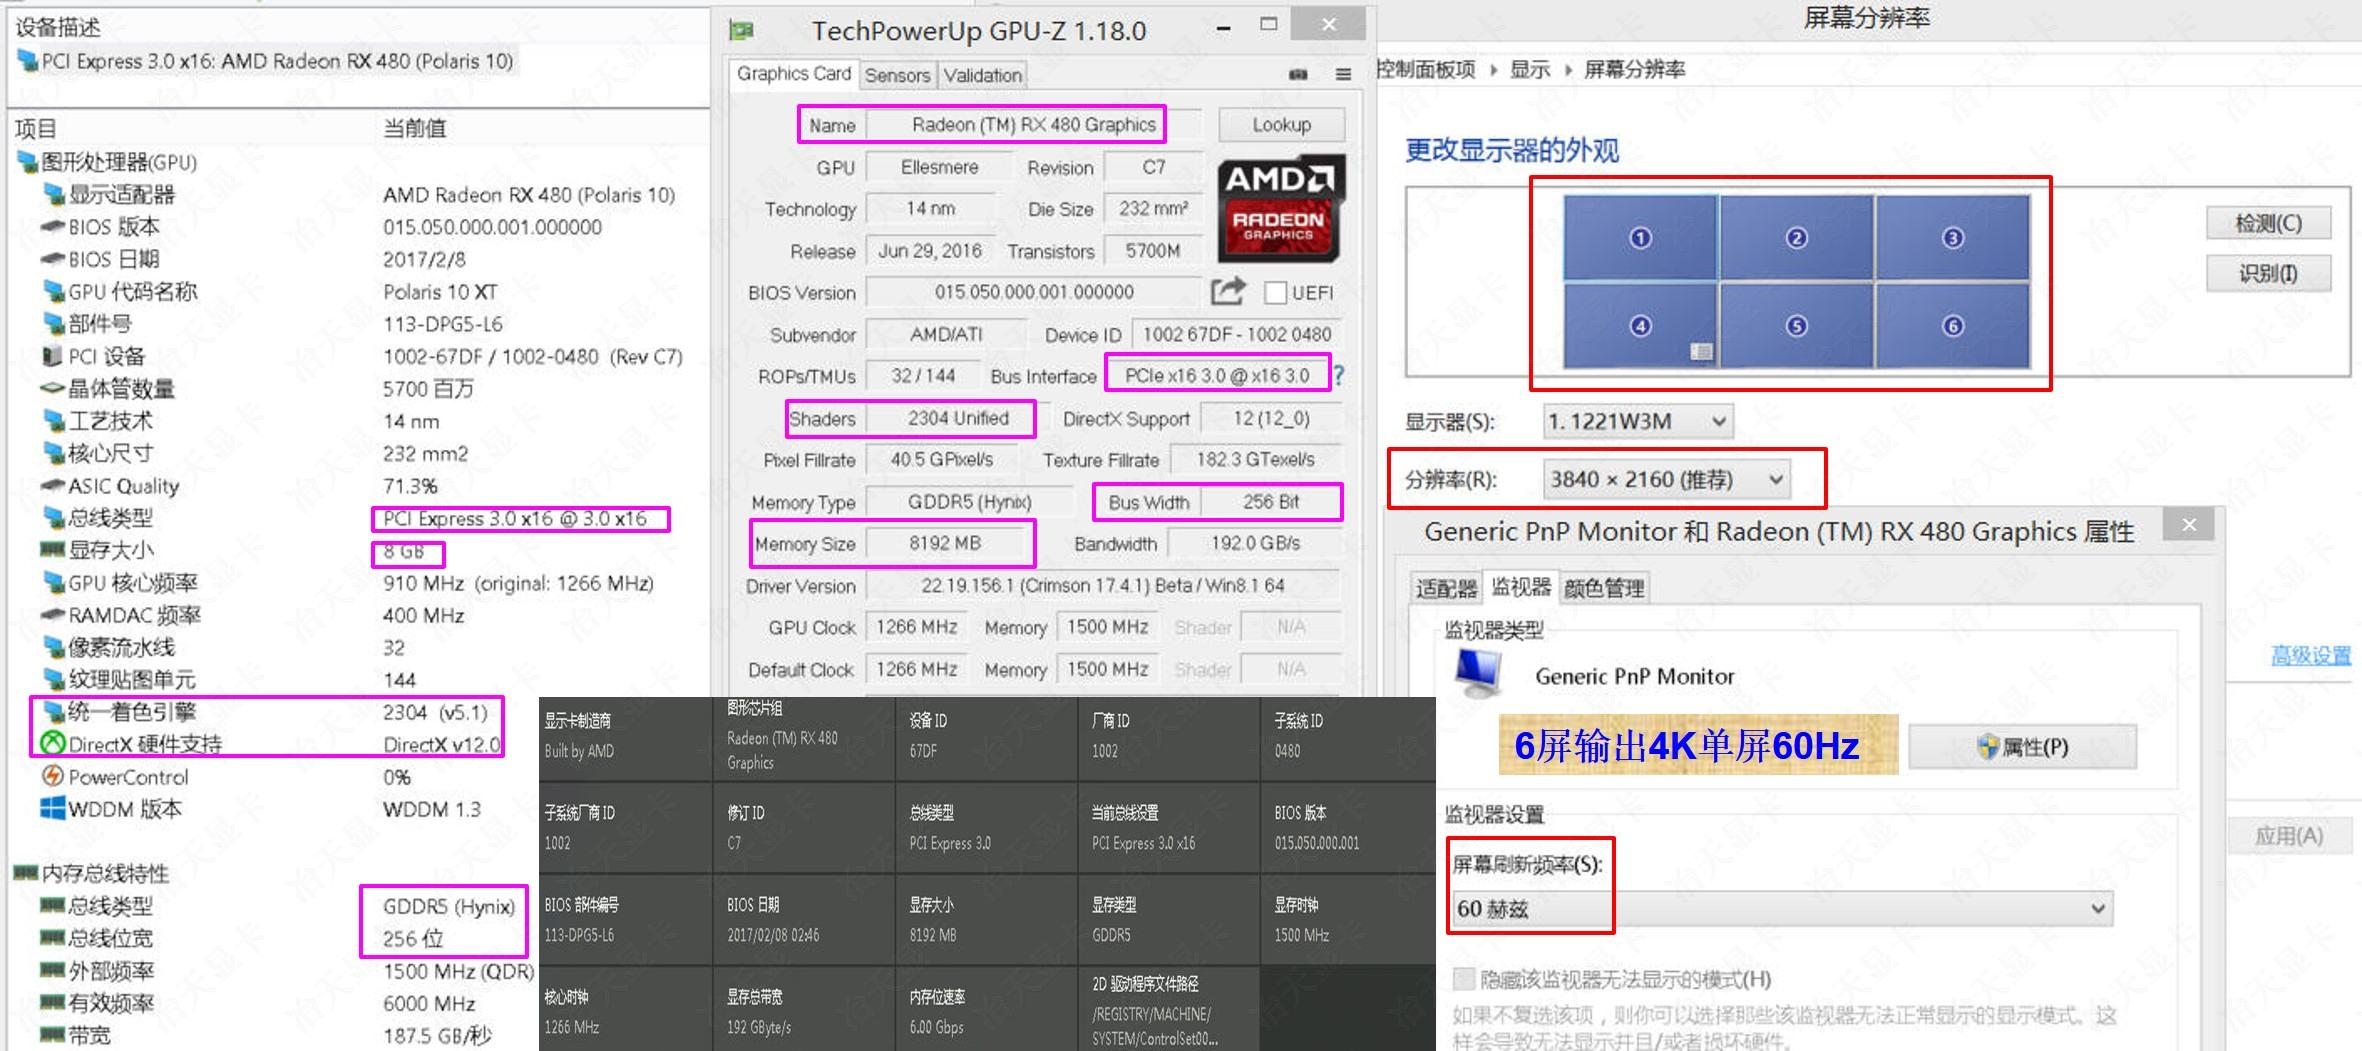 pcidv.com/8GB冶天RX480一机6屏显卡6DP分屏输出4K 60Hz